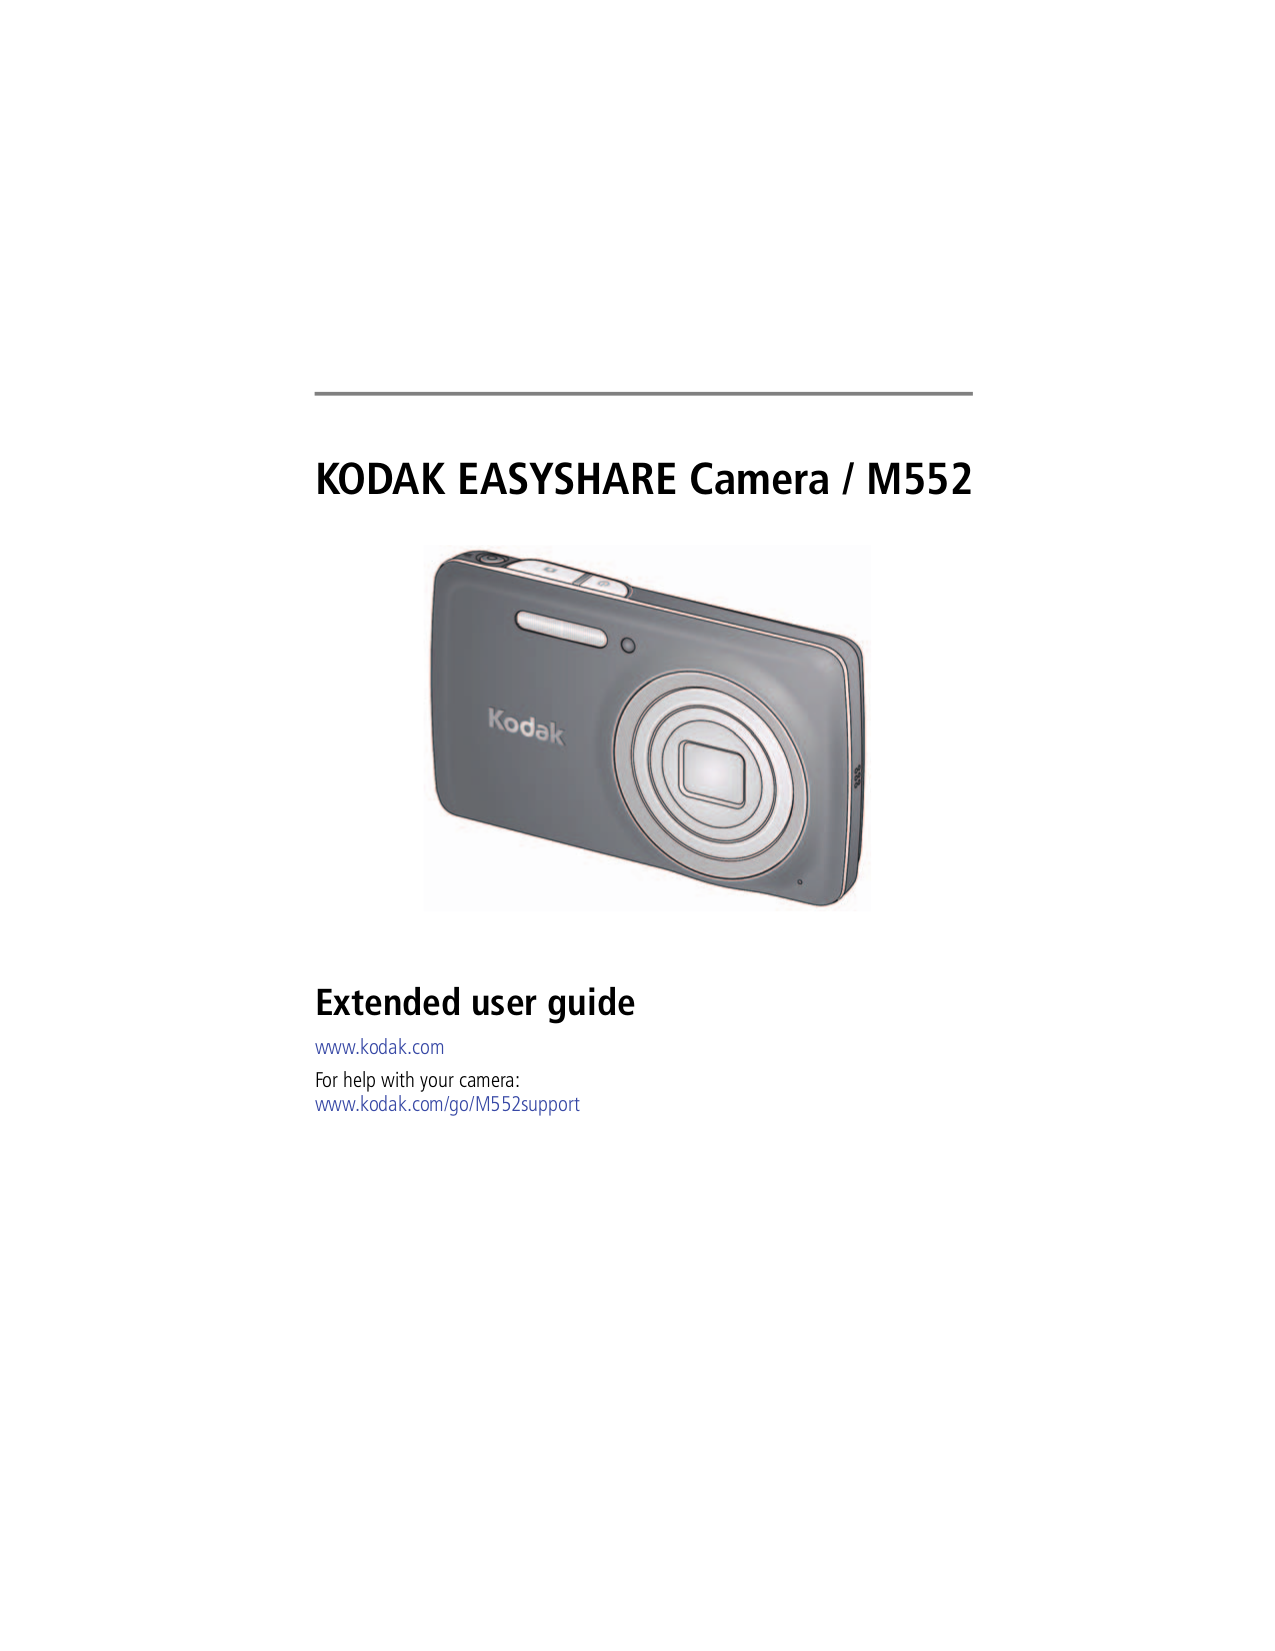 pdf for Kodak Digital Camera EasyShare M552 manual